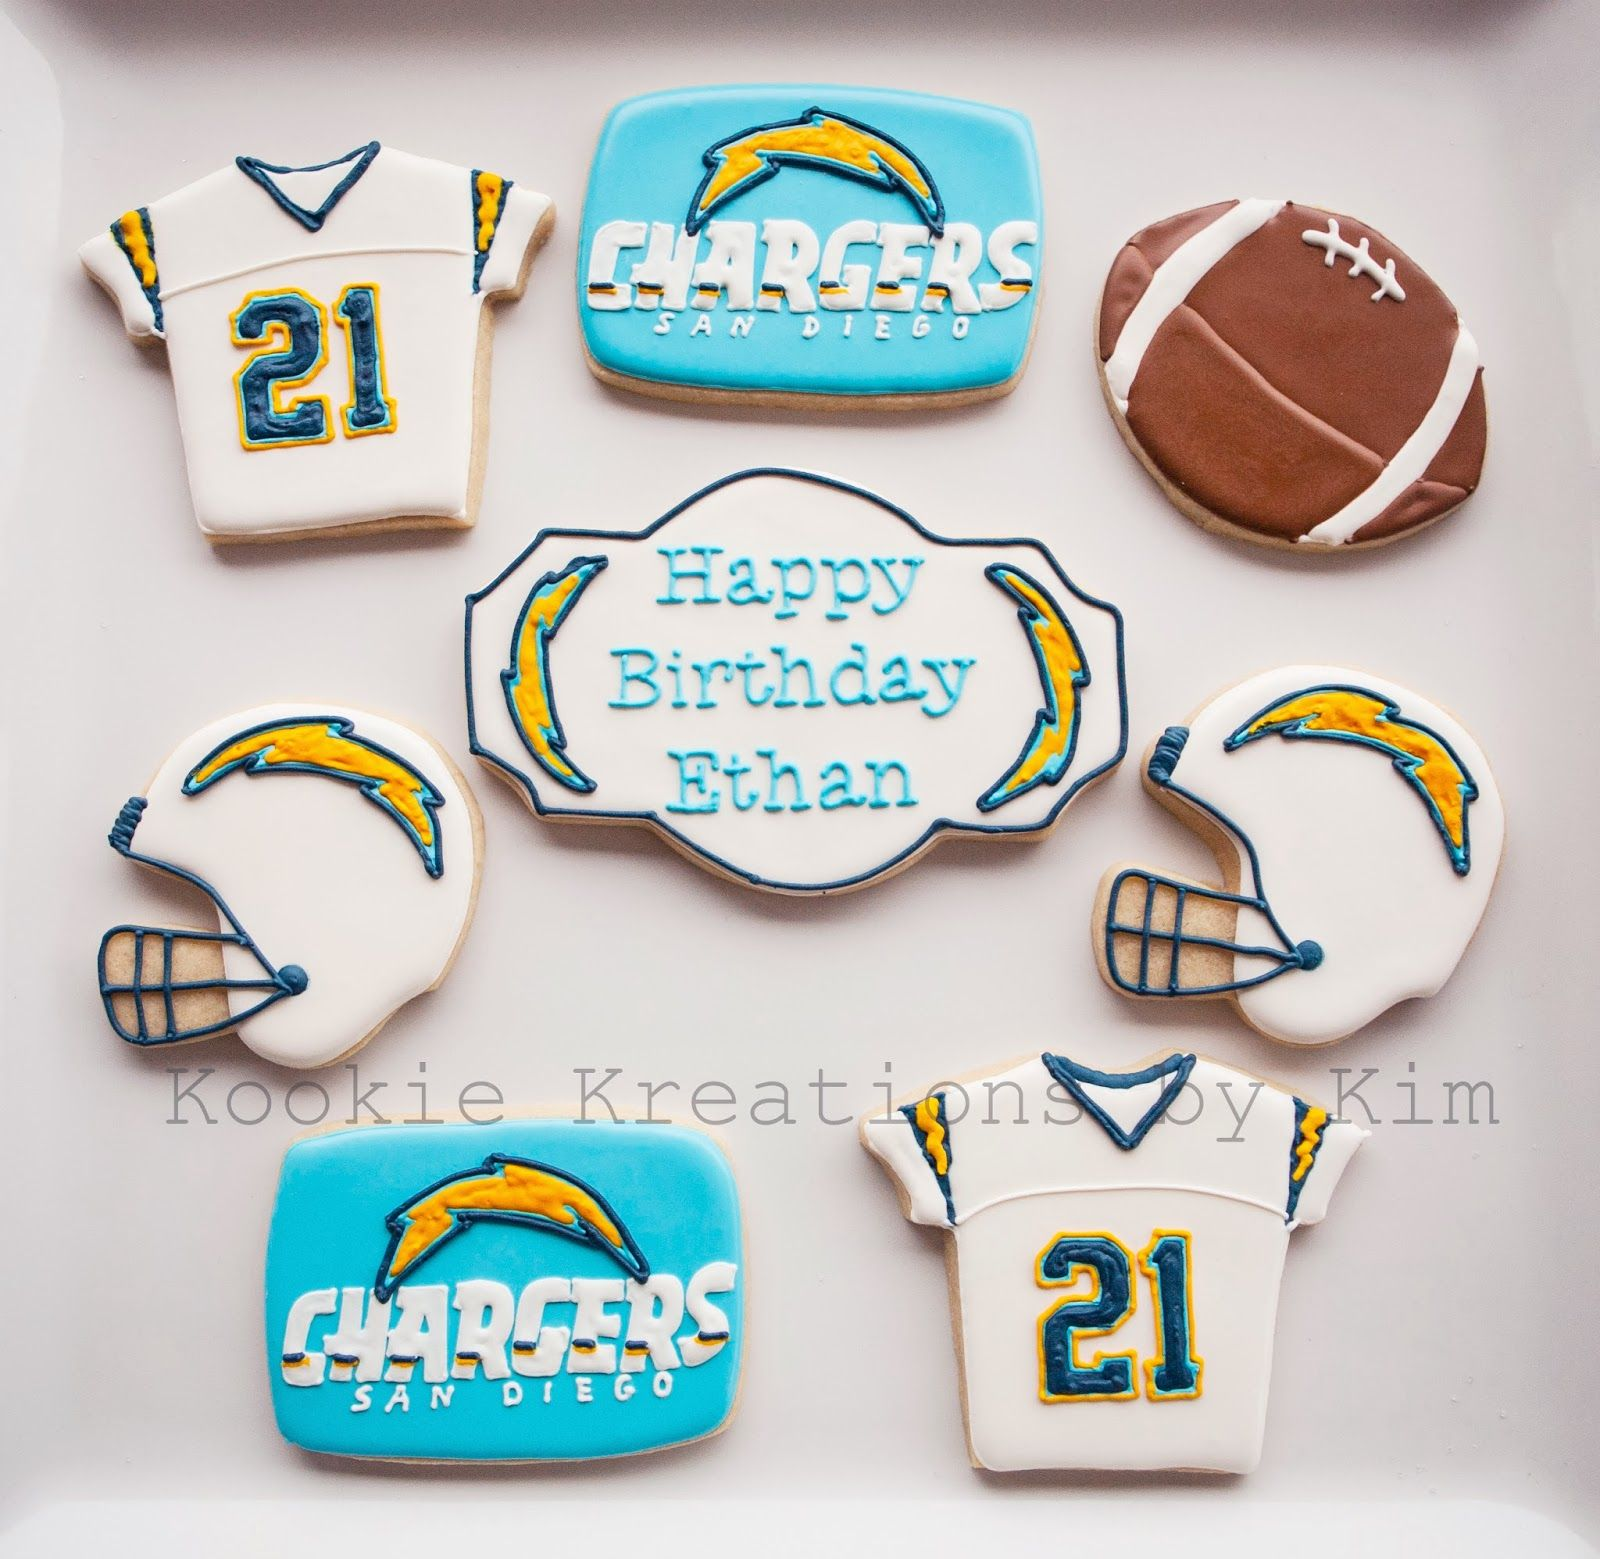 San Diego Chargers Cake: San Diego Chargers Cookies - Kookie Kreations By Kim